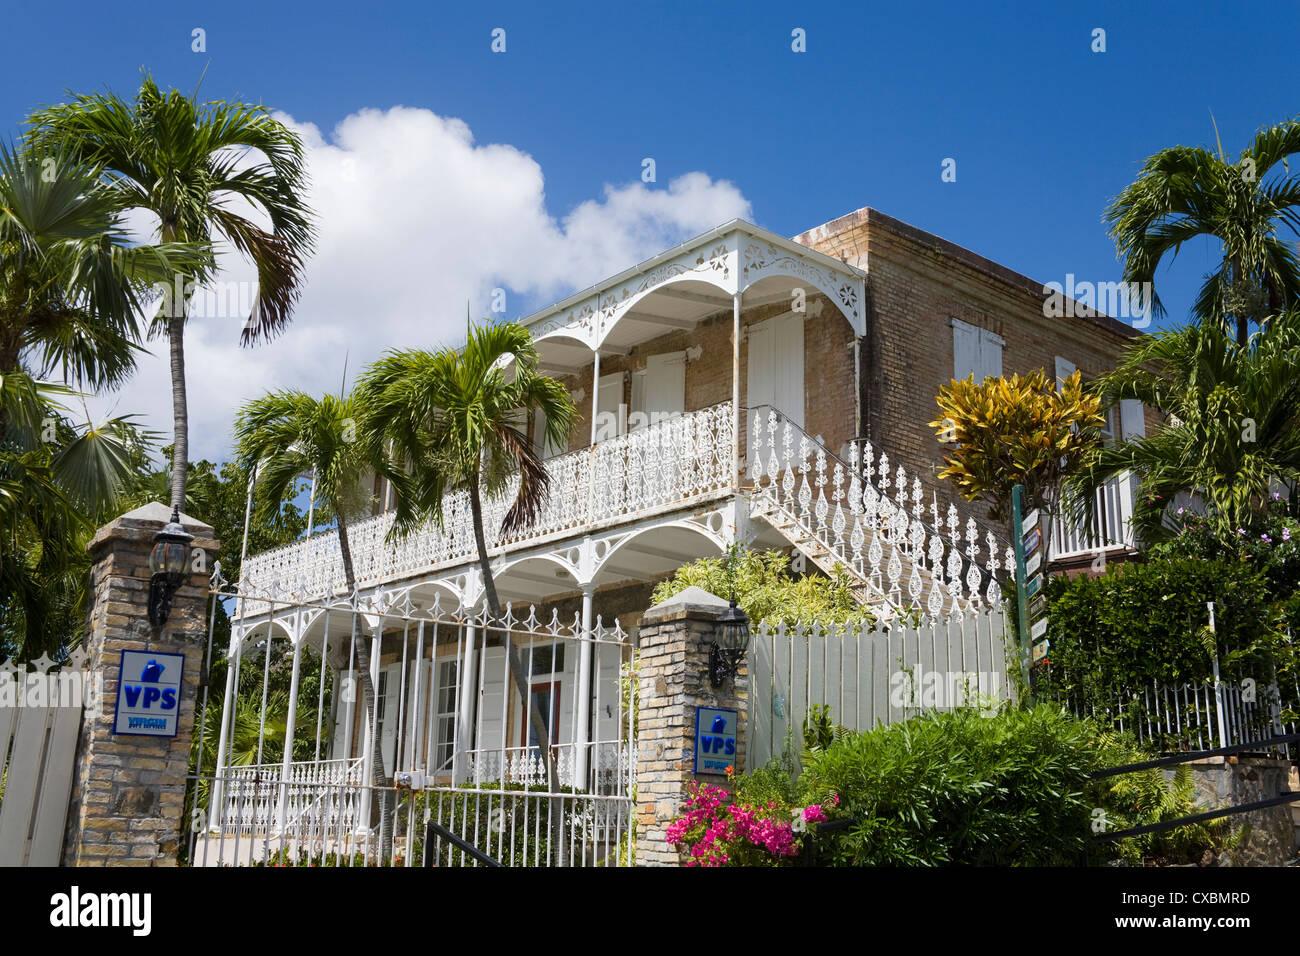 Villa Notman in Kongens Quarter, Charlotte Amalie, St. Thomas Island, U.S. Virgin Islands, West Indies - Stock Image